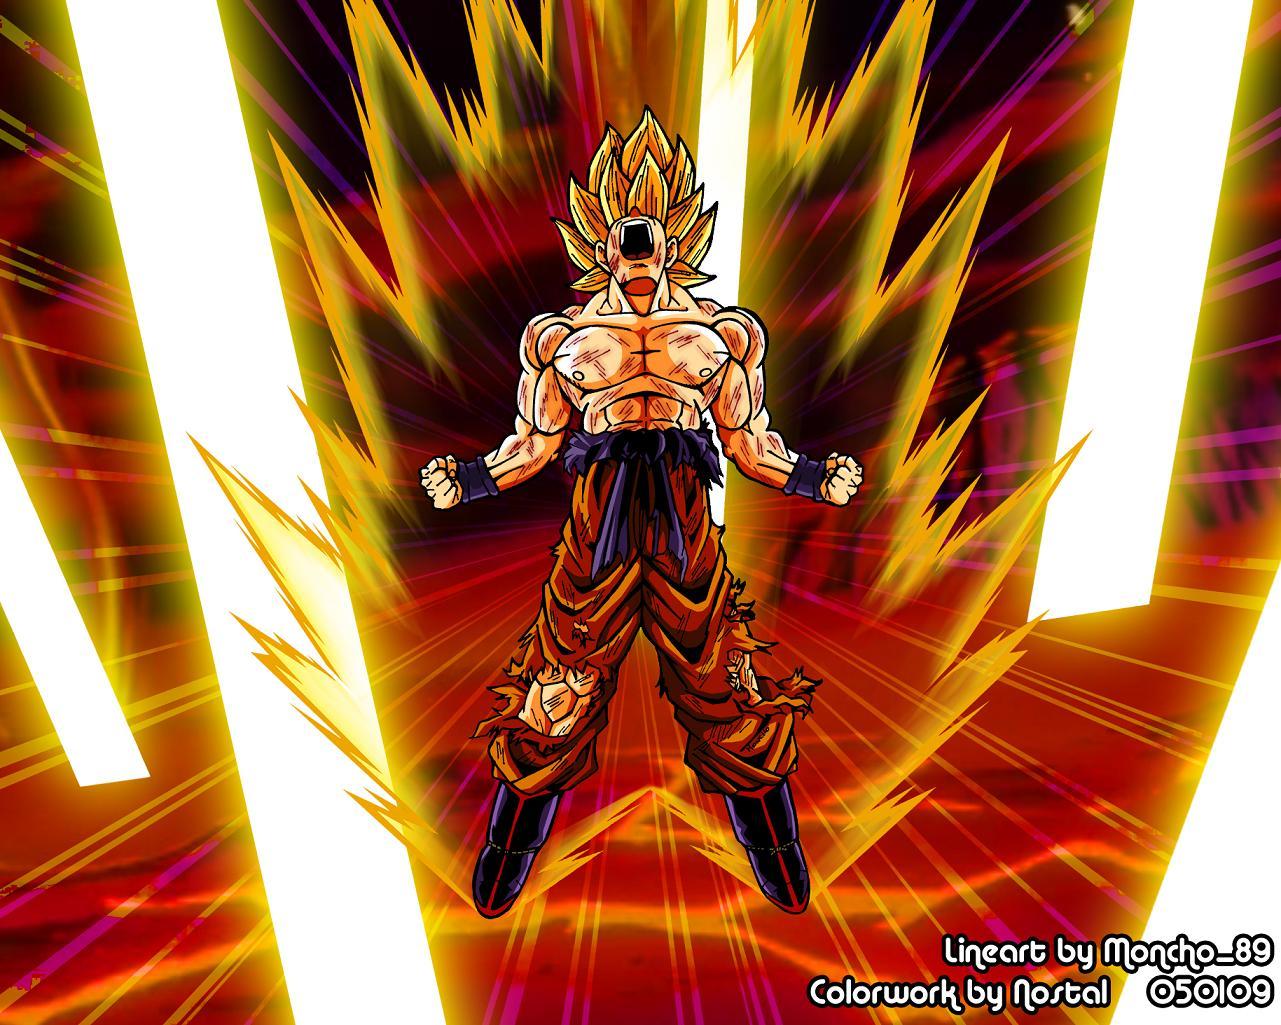 http://static2.wikia.nocookie.net/__cb20120822181227/dragonball/es/images/9/97/Goku_super_saiyajin_ft_nostal_by_moncho_m89.jpg